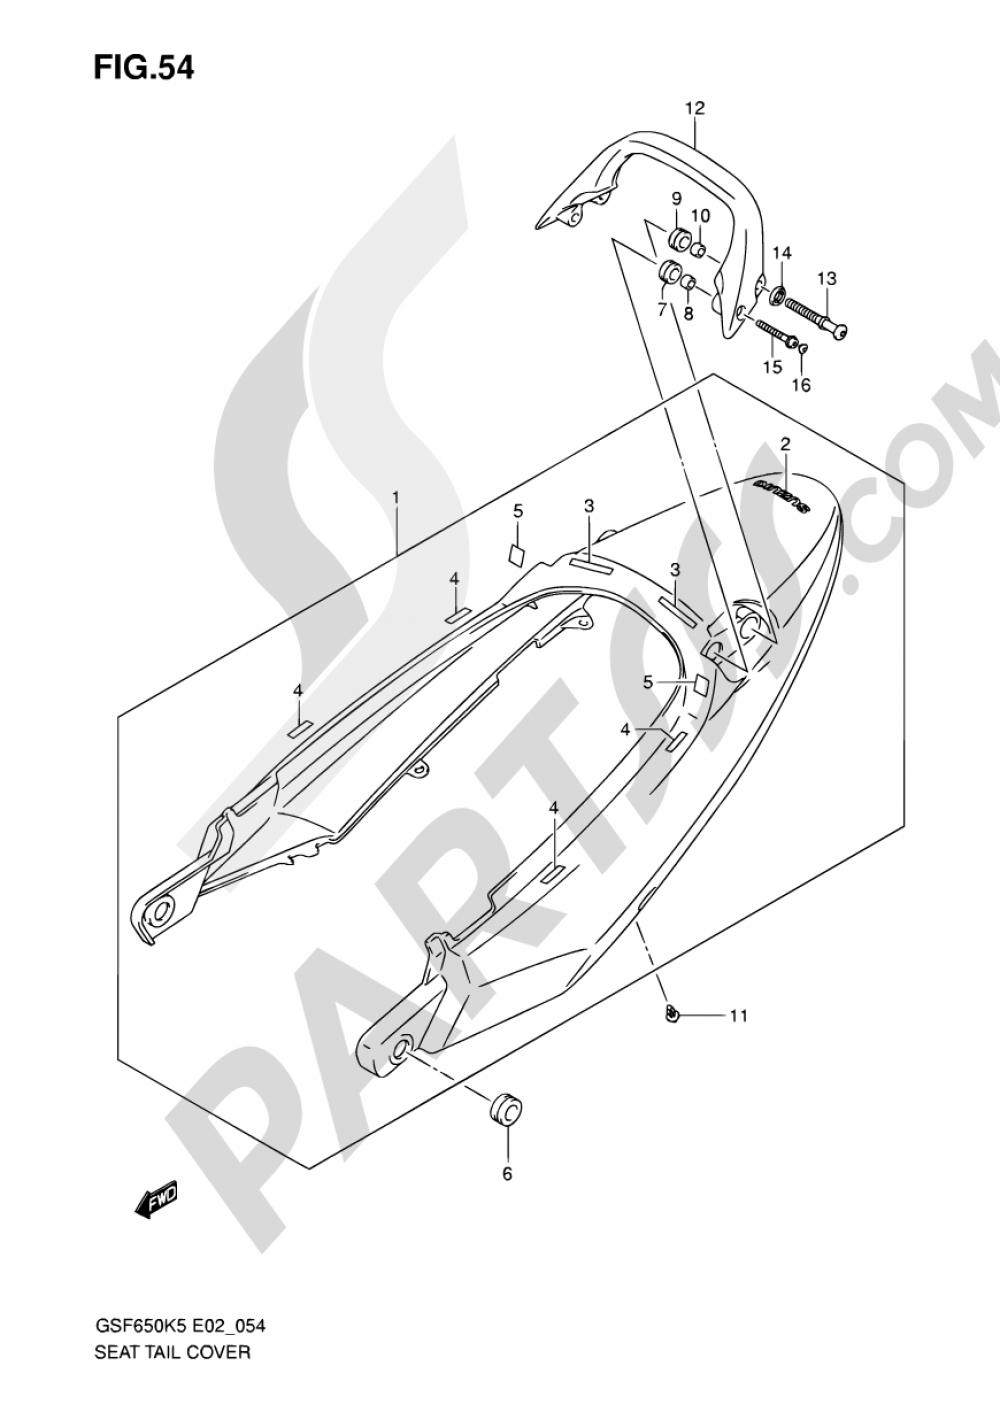 54 - SEAT TAIL COVER (GSF650SK5/SUK5/SAK5/SUAK5) Suzuki BANDIT GSF650 2006